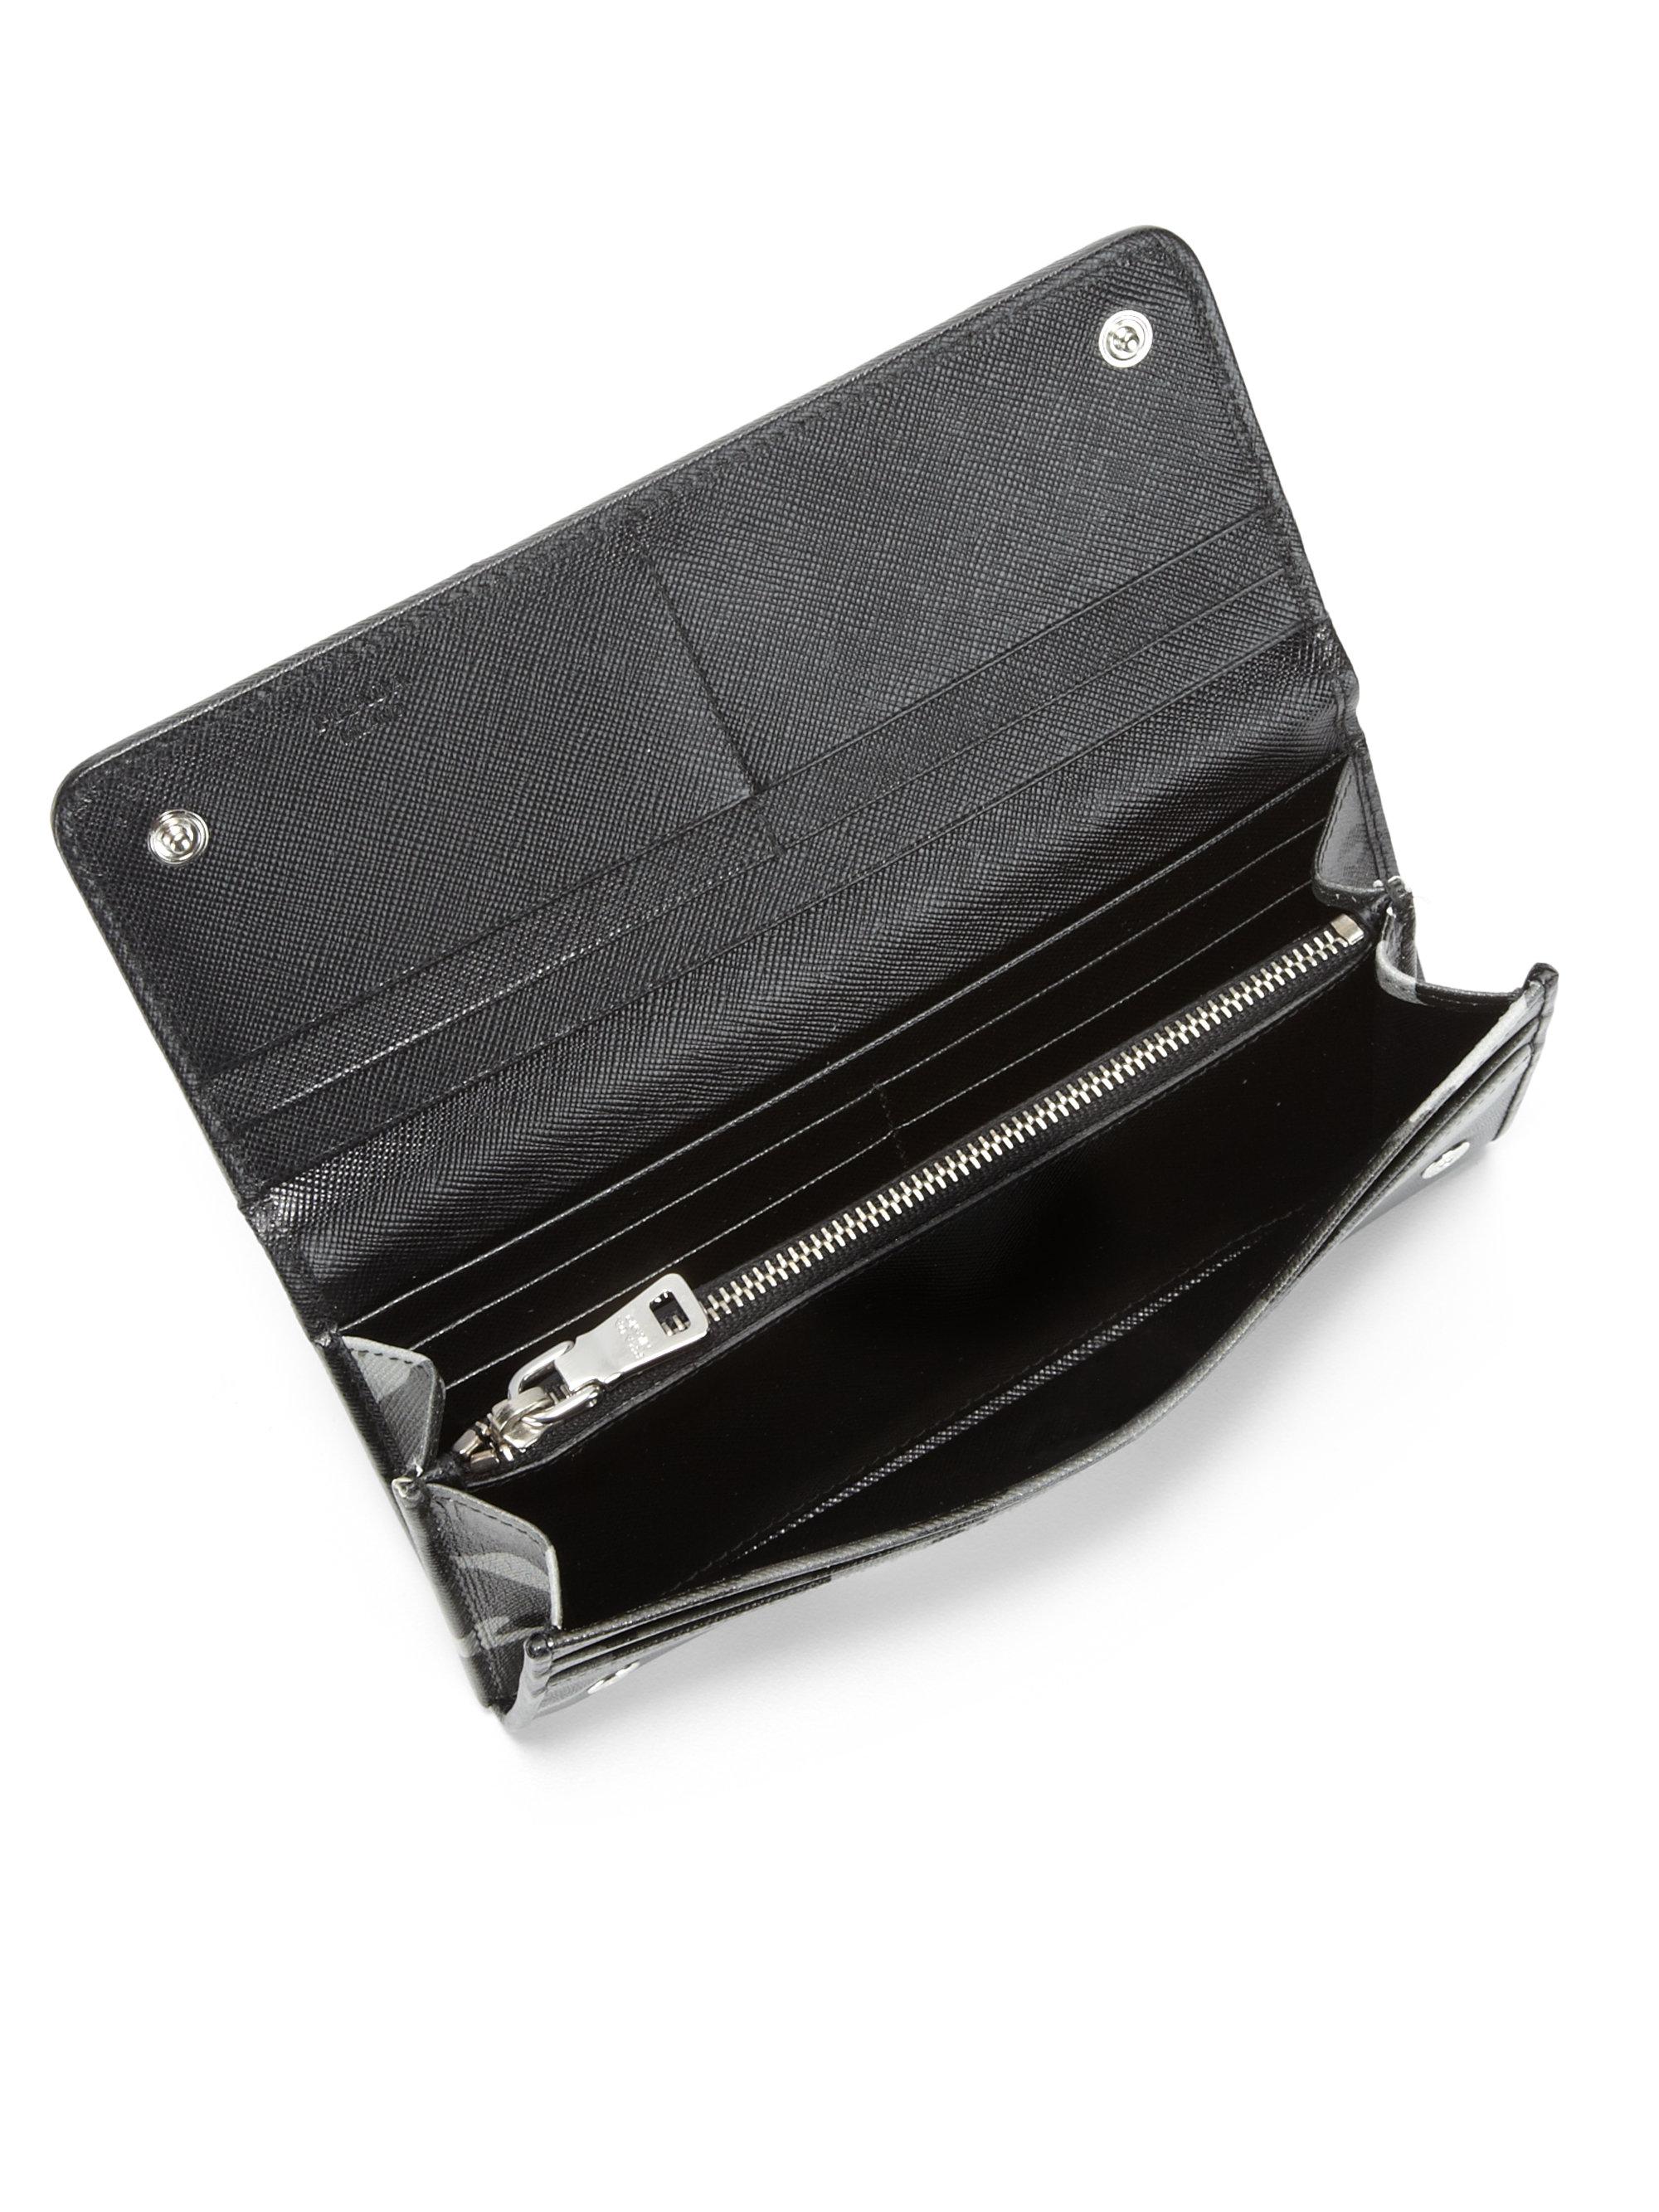 prada pink leather handbag - prada red patent leather wallet